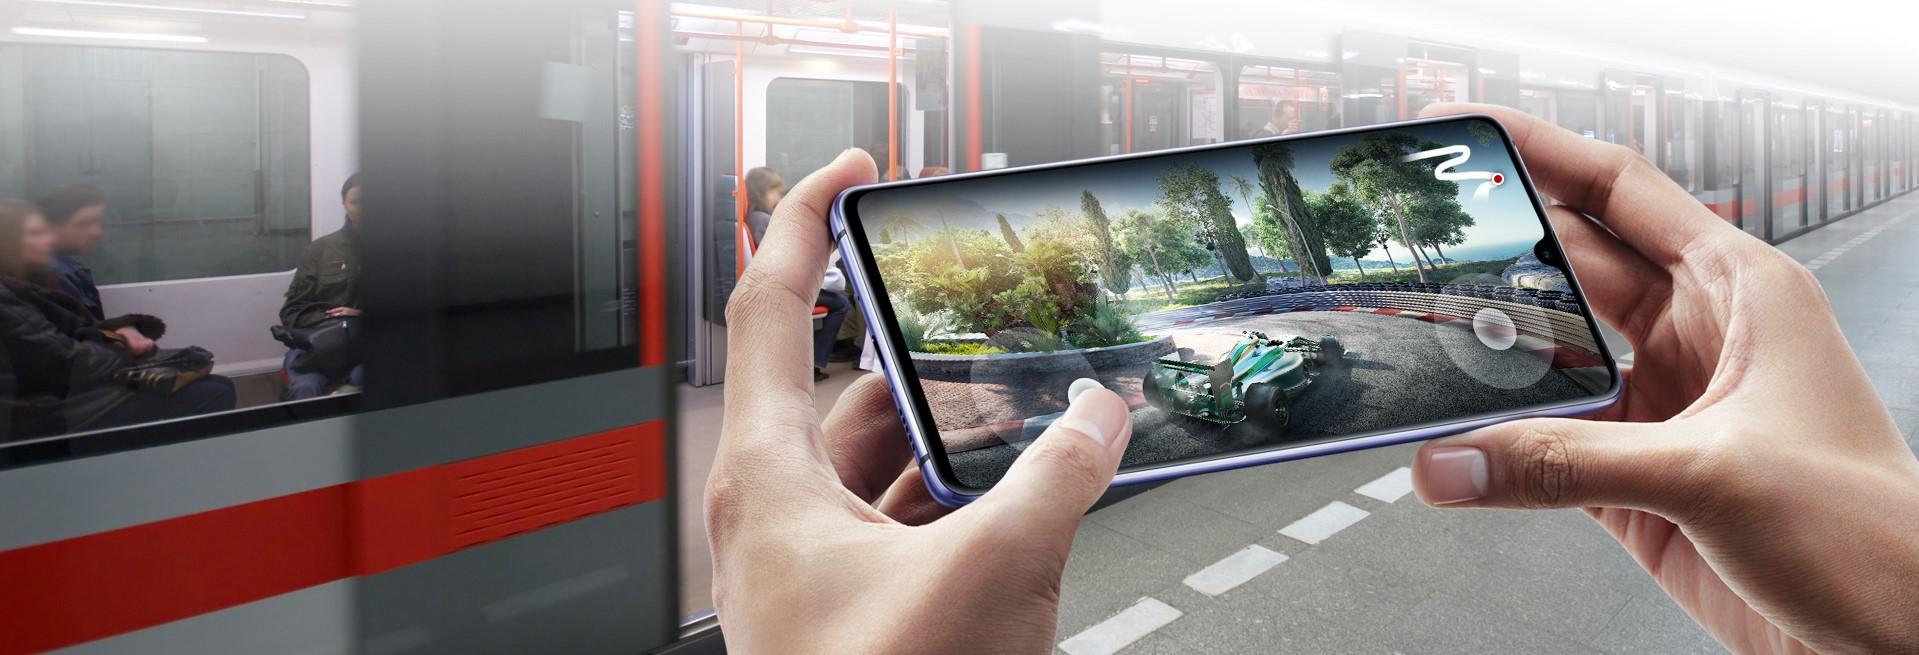 Huawei-mate20-x-advanced-network-connectivity.jpg